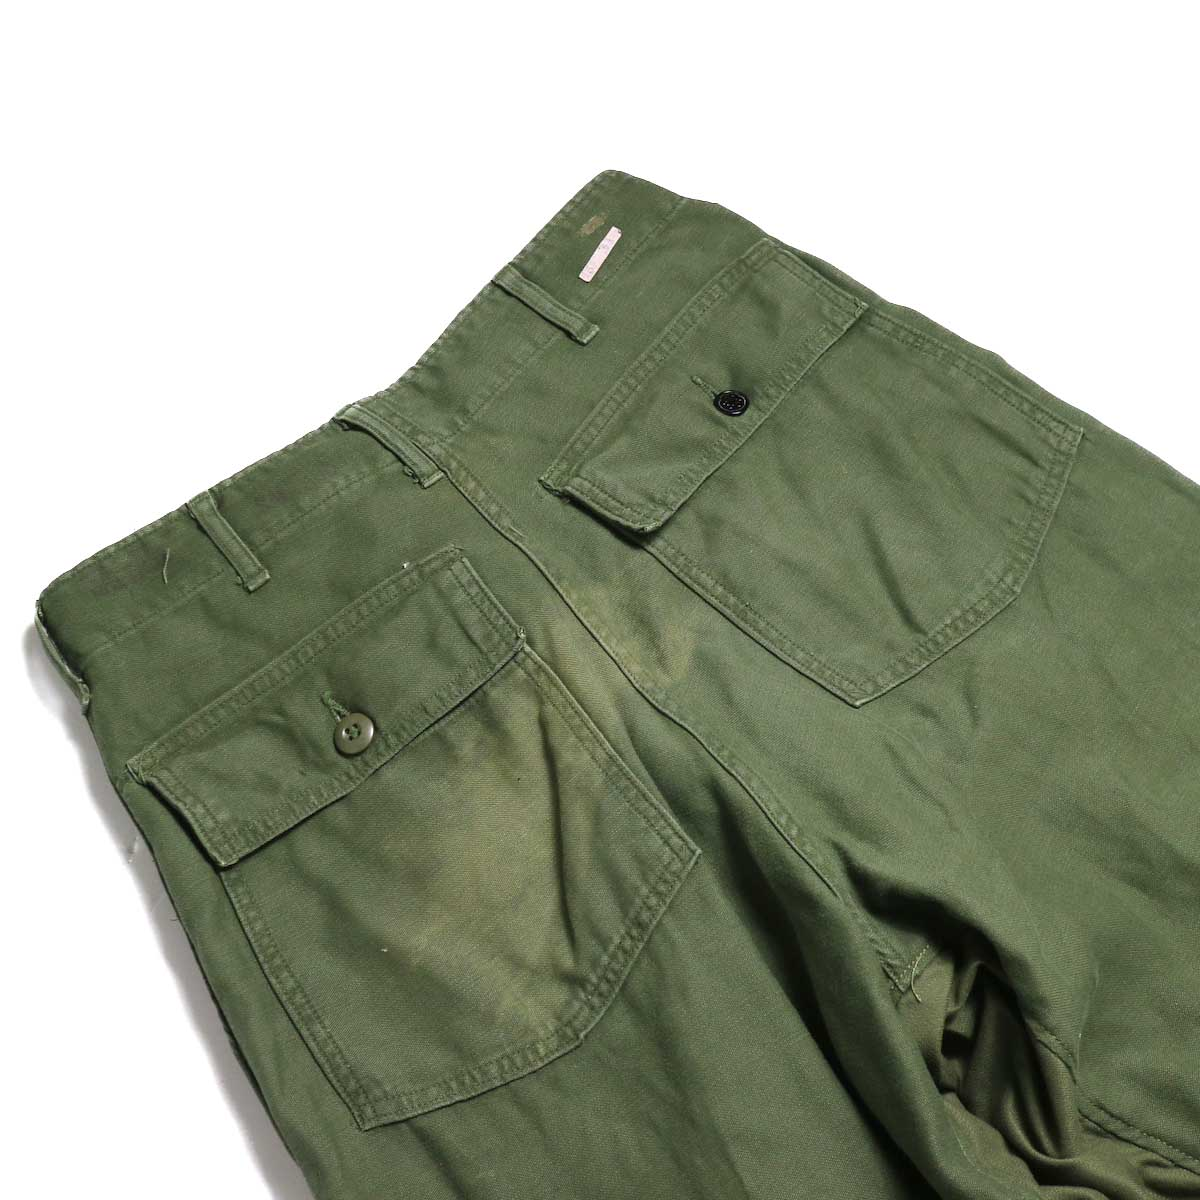 BONUM / Military FAT Pants (A) フラップポケット